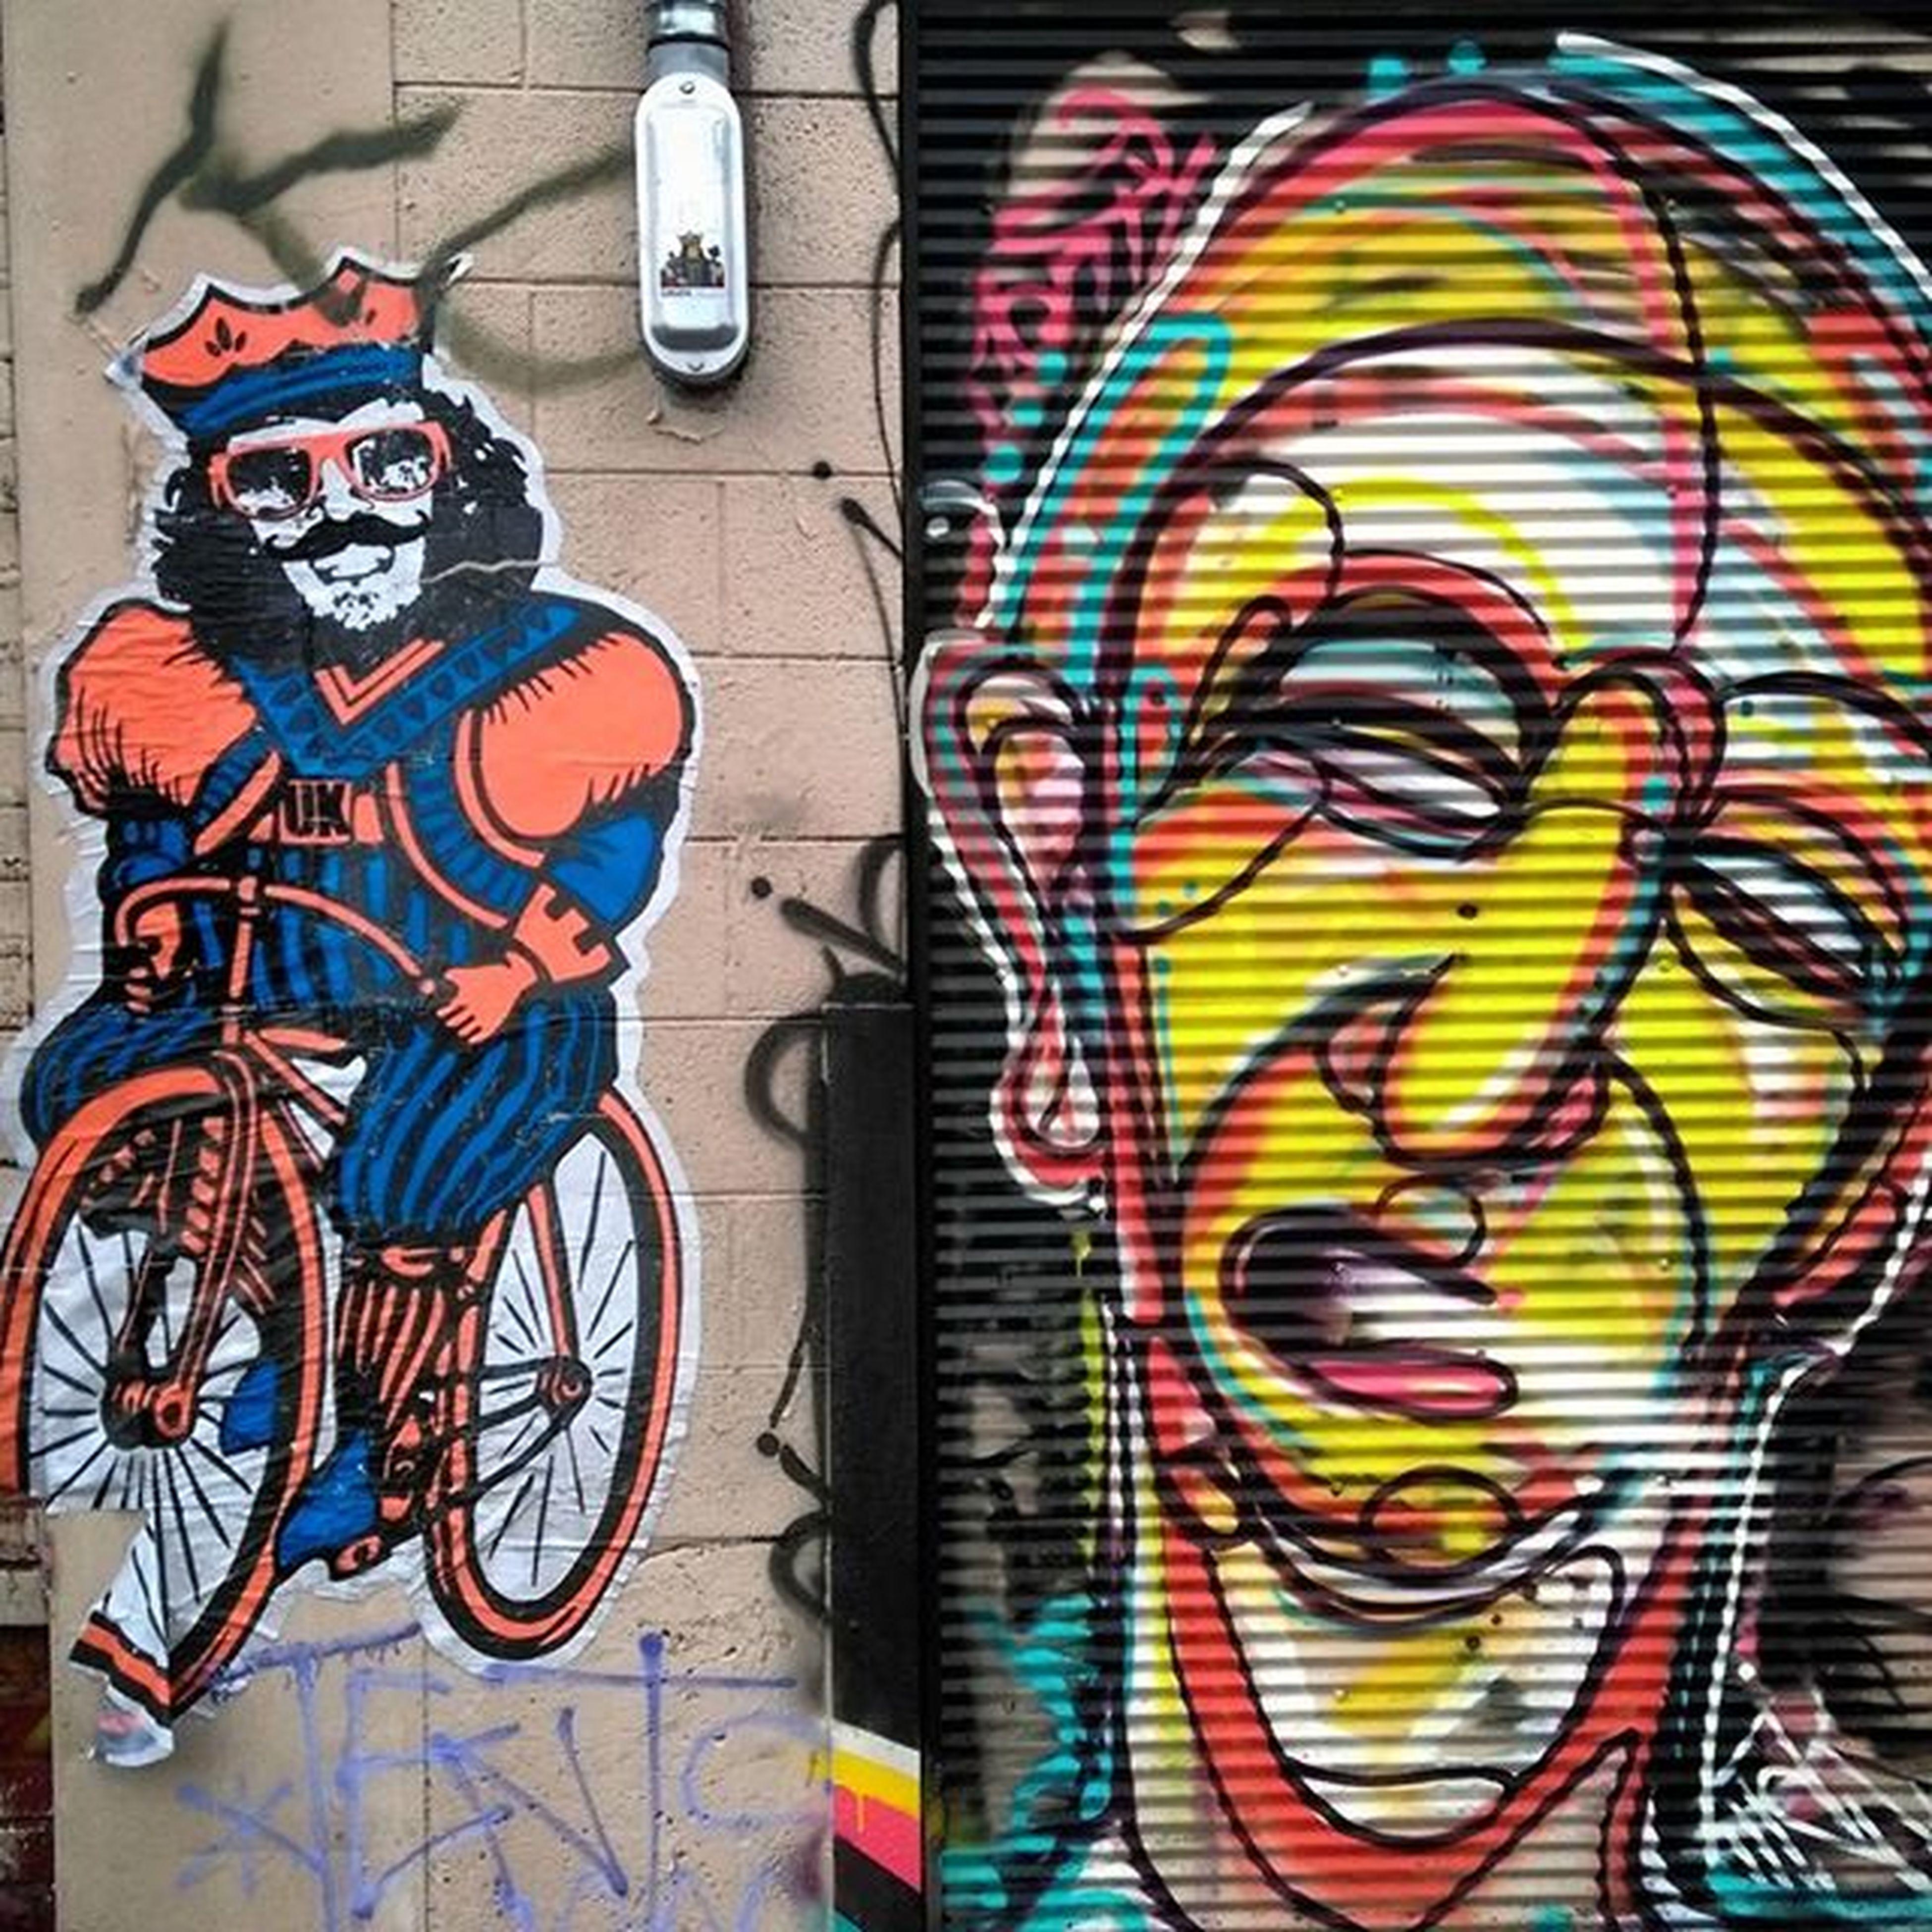 Wheatpaste Pasteup Streetart Denverstreetart Graffiti Denvergraffiti Graffhunter Graffhunting Uglykids @illson Rsa_streetview Rsa_graffiti Instagraffiti